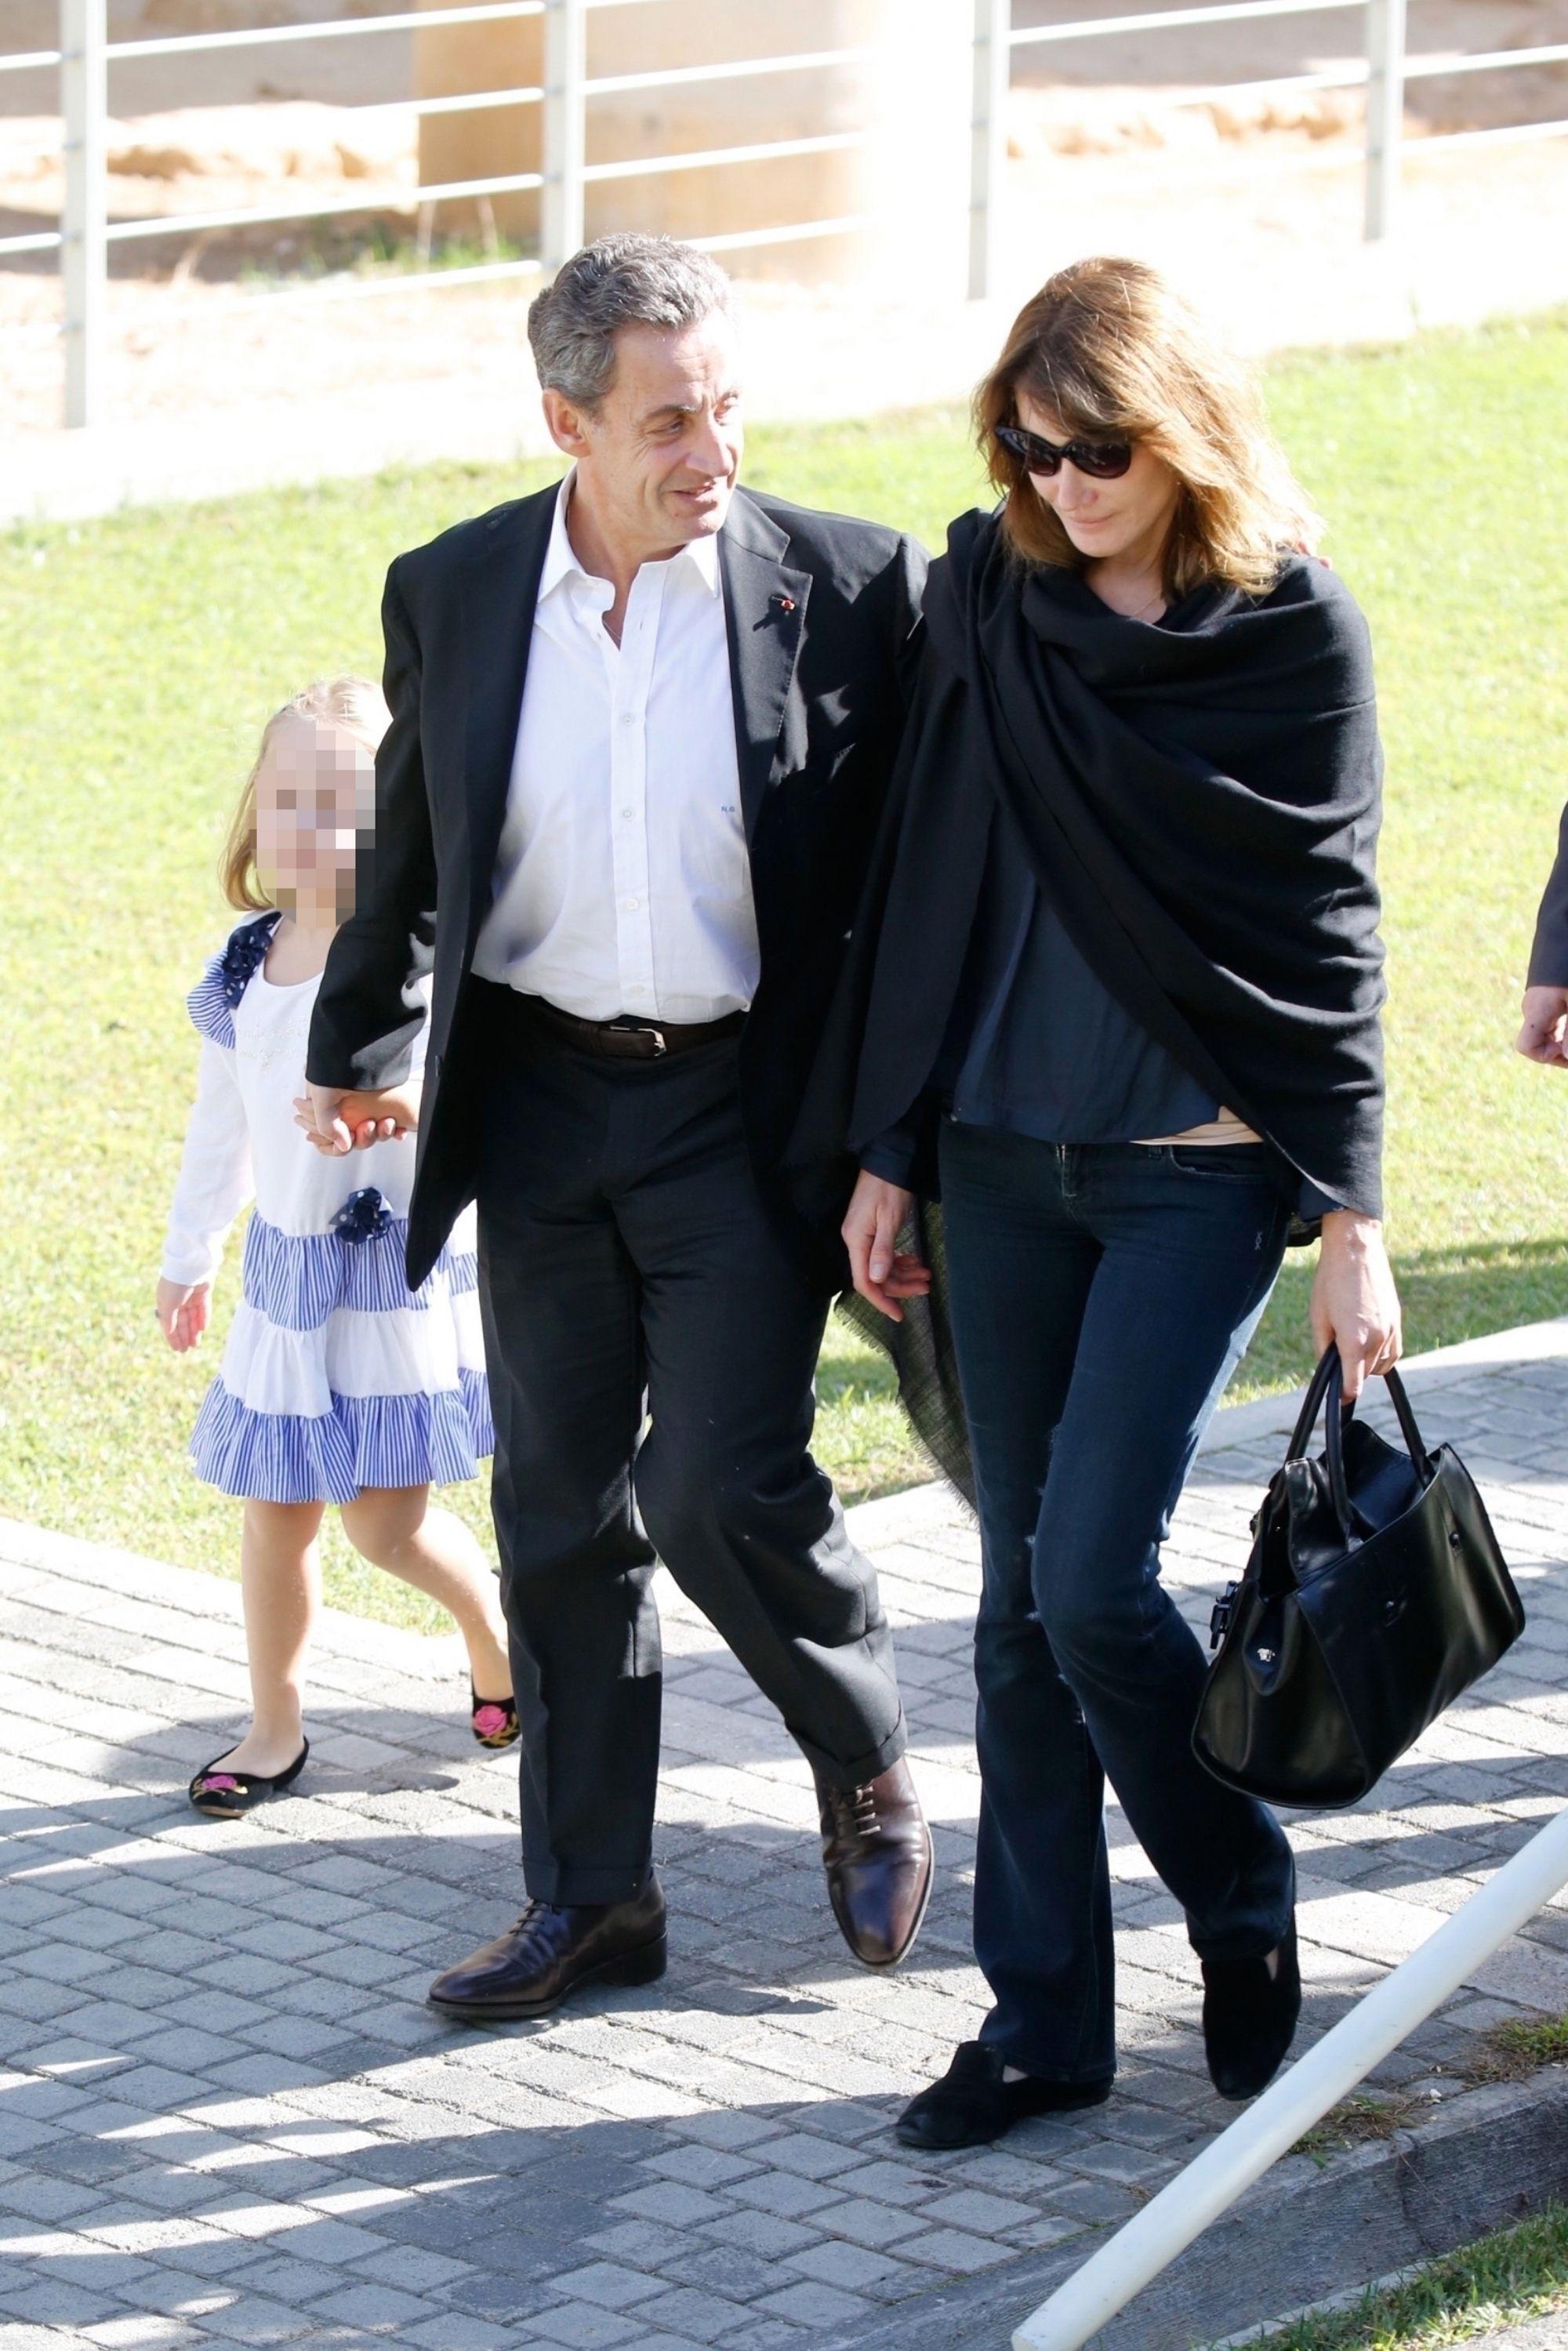 Carla Bruni Sarkozy Son Message D Amour A Nicolas Pour Son Anniversaire Carla Bruni Carla Bruni Sarkozy Vetements De Printemps